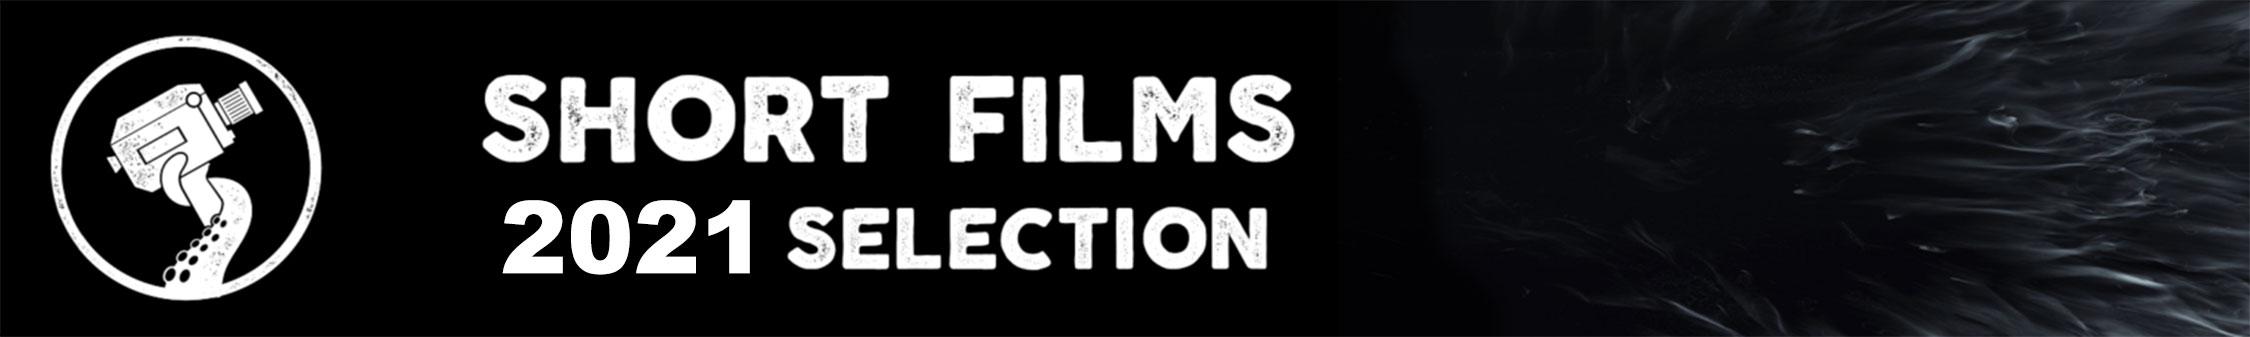 shortfilm2021banner